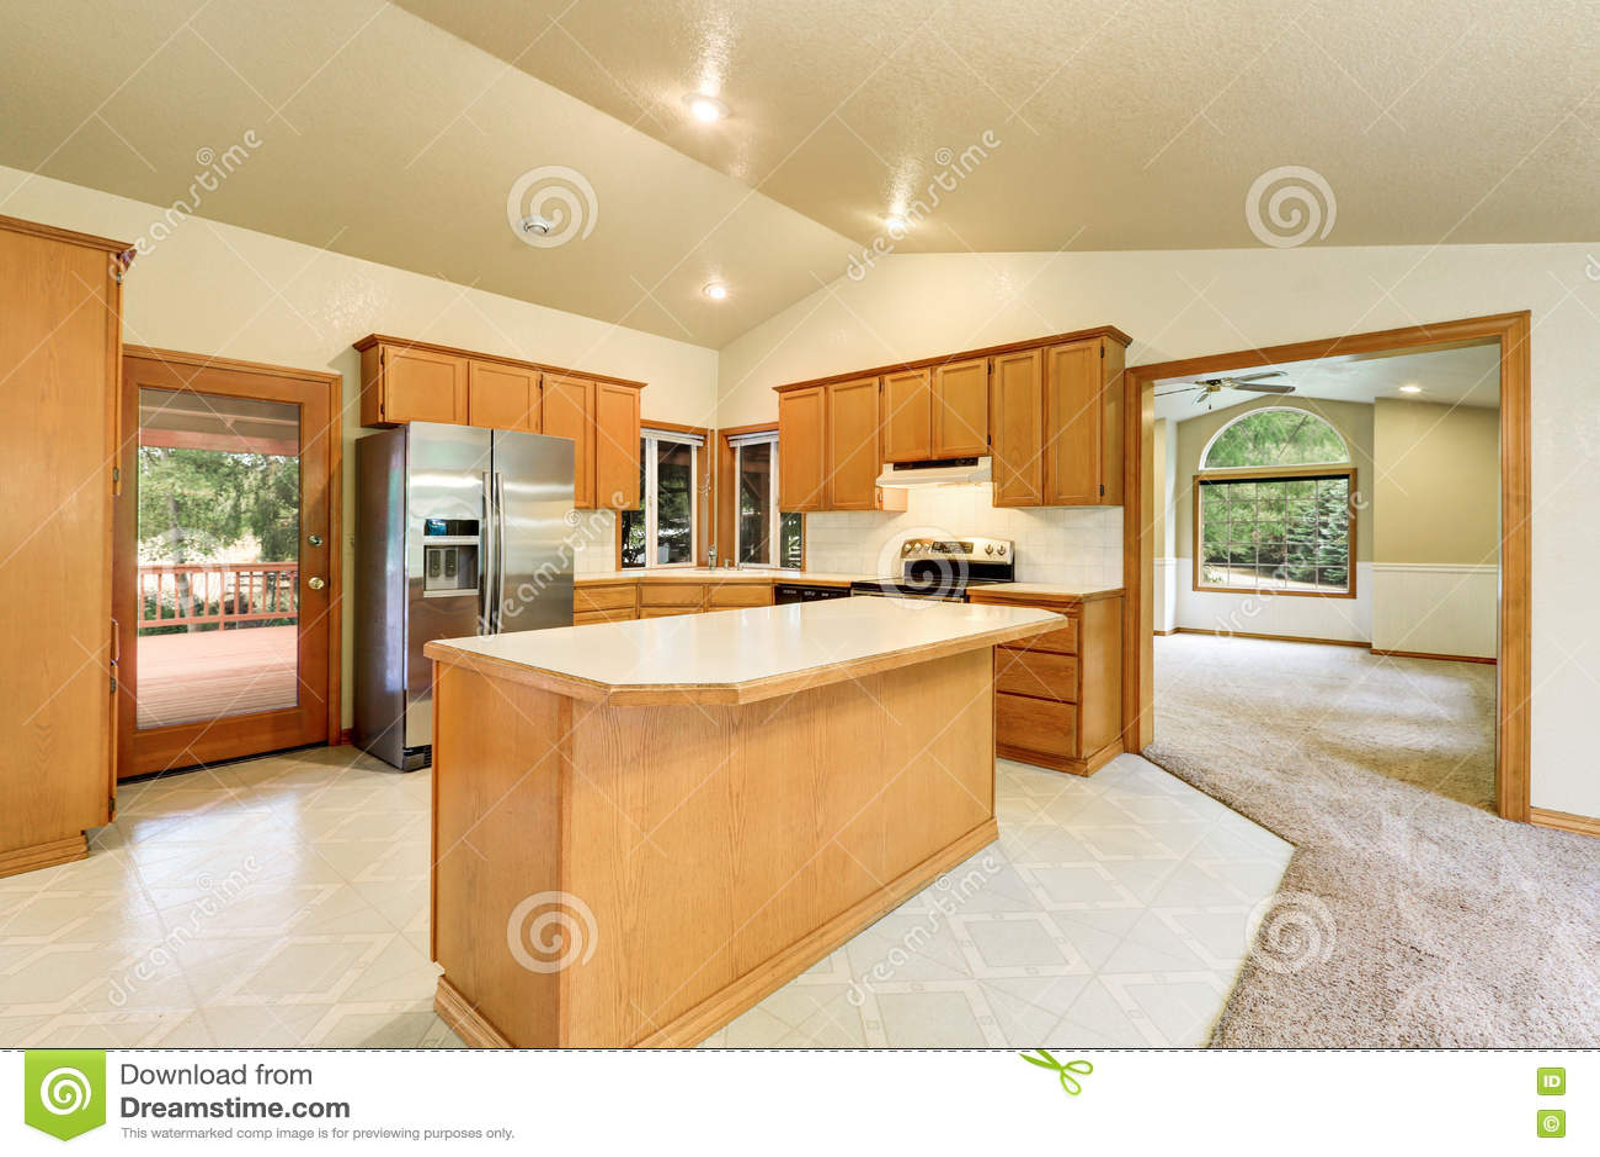 farm kitchen sink high table sets 厨房室内部在马大农场库存照片 图片包括有水槽 最高限额 西北 机柜 厨房室内部在有拱顶式顶棚的马大农场 木舱内甲板镶板了内阁和锦砖地板西北 美国